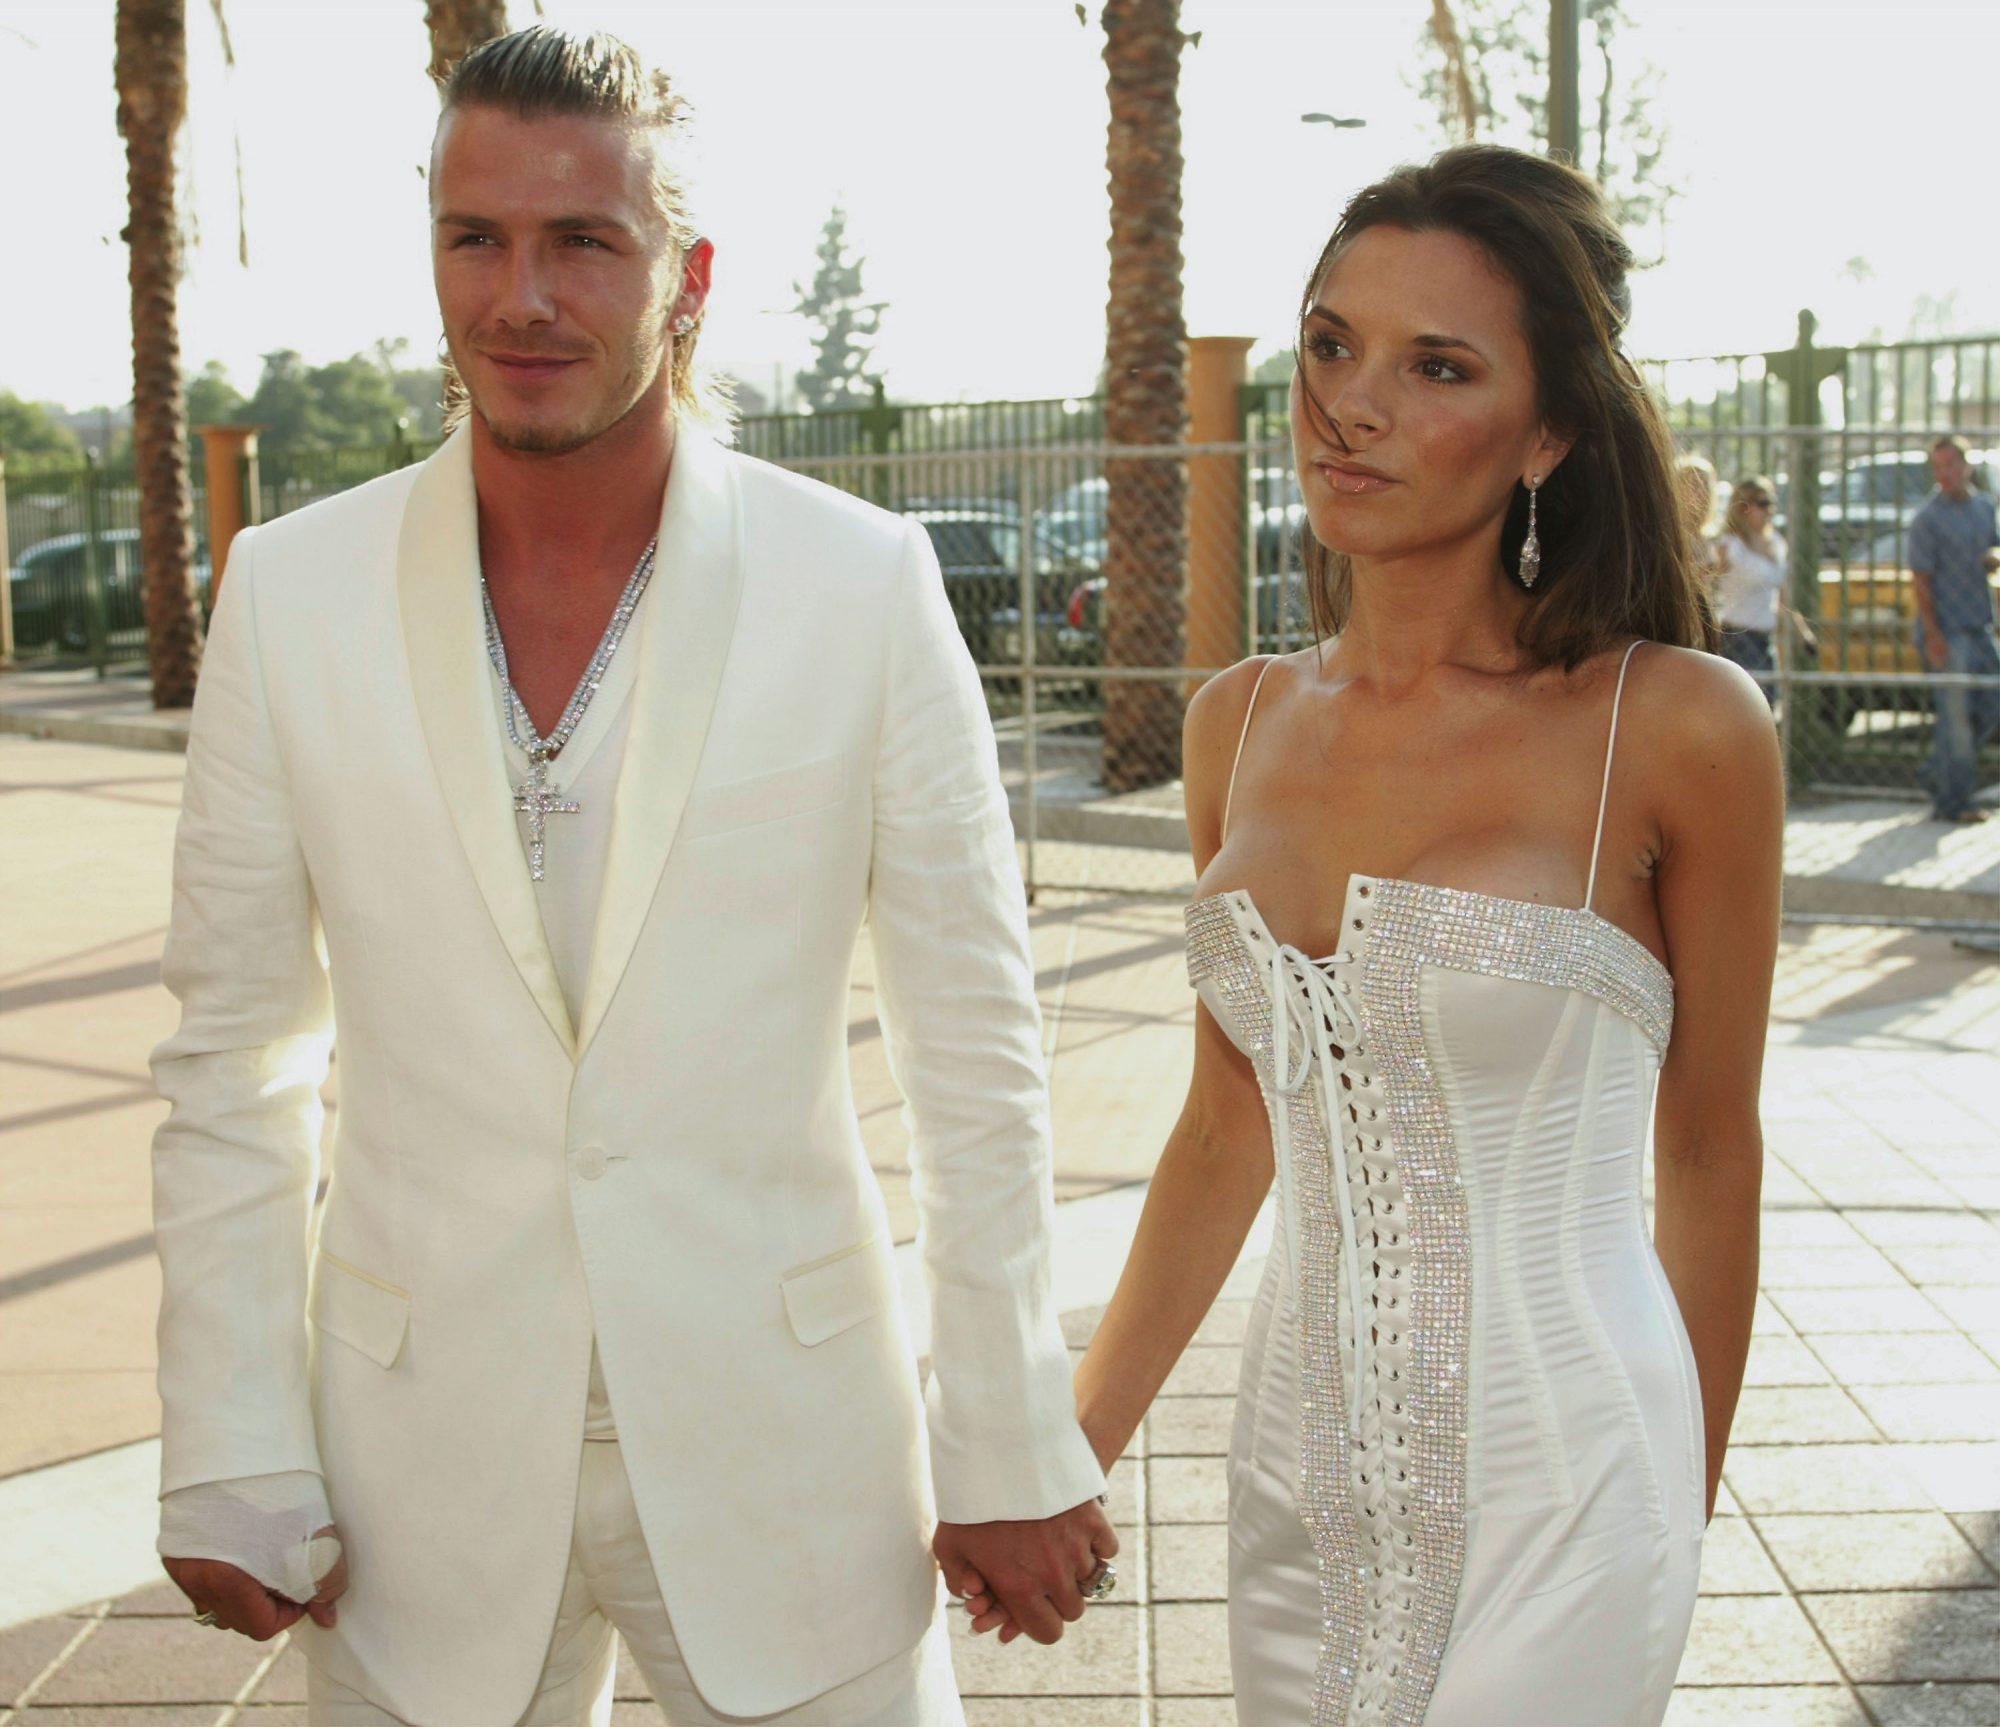 David Beckham Blasts Affair Allegations